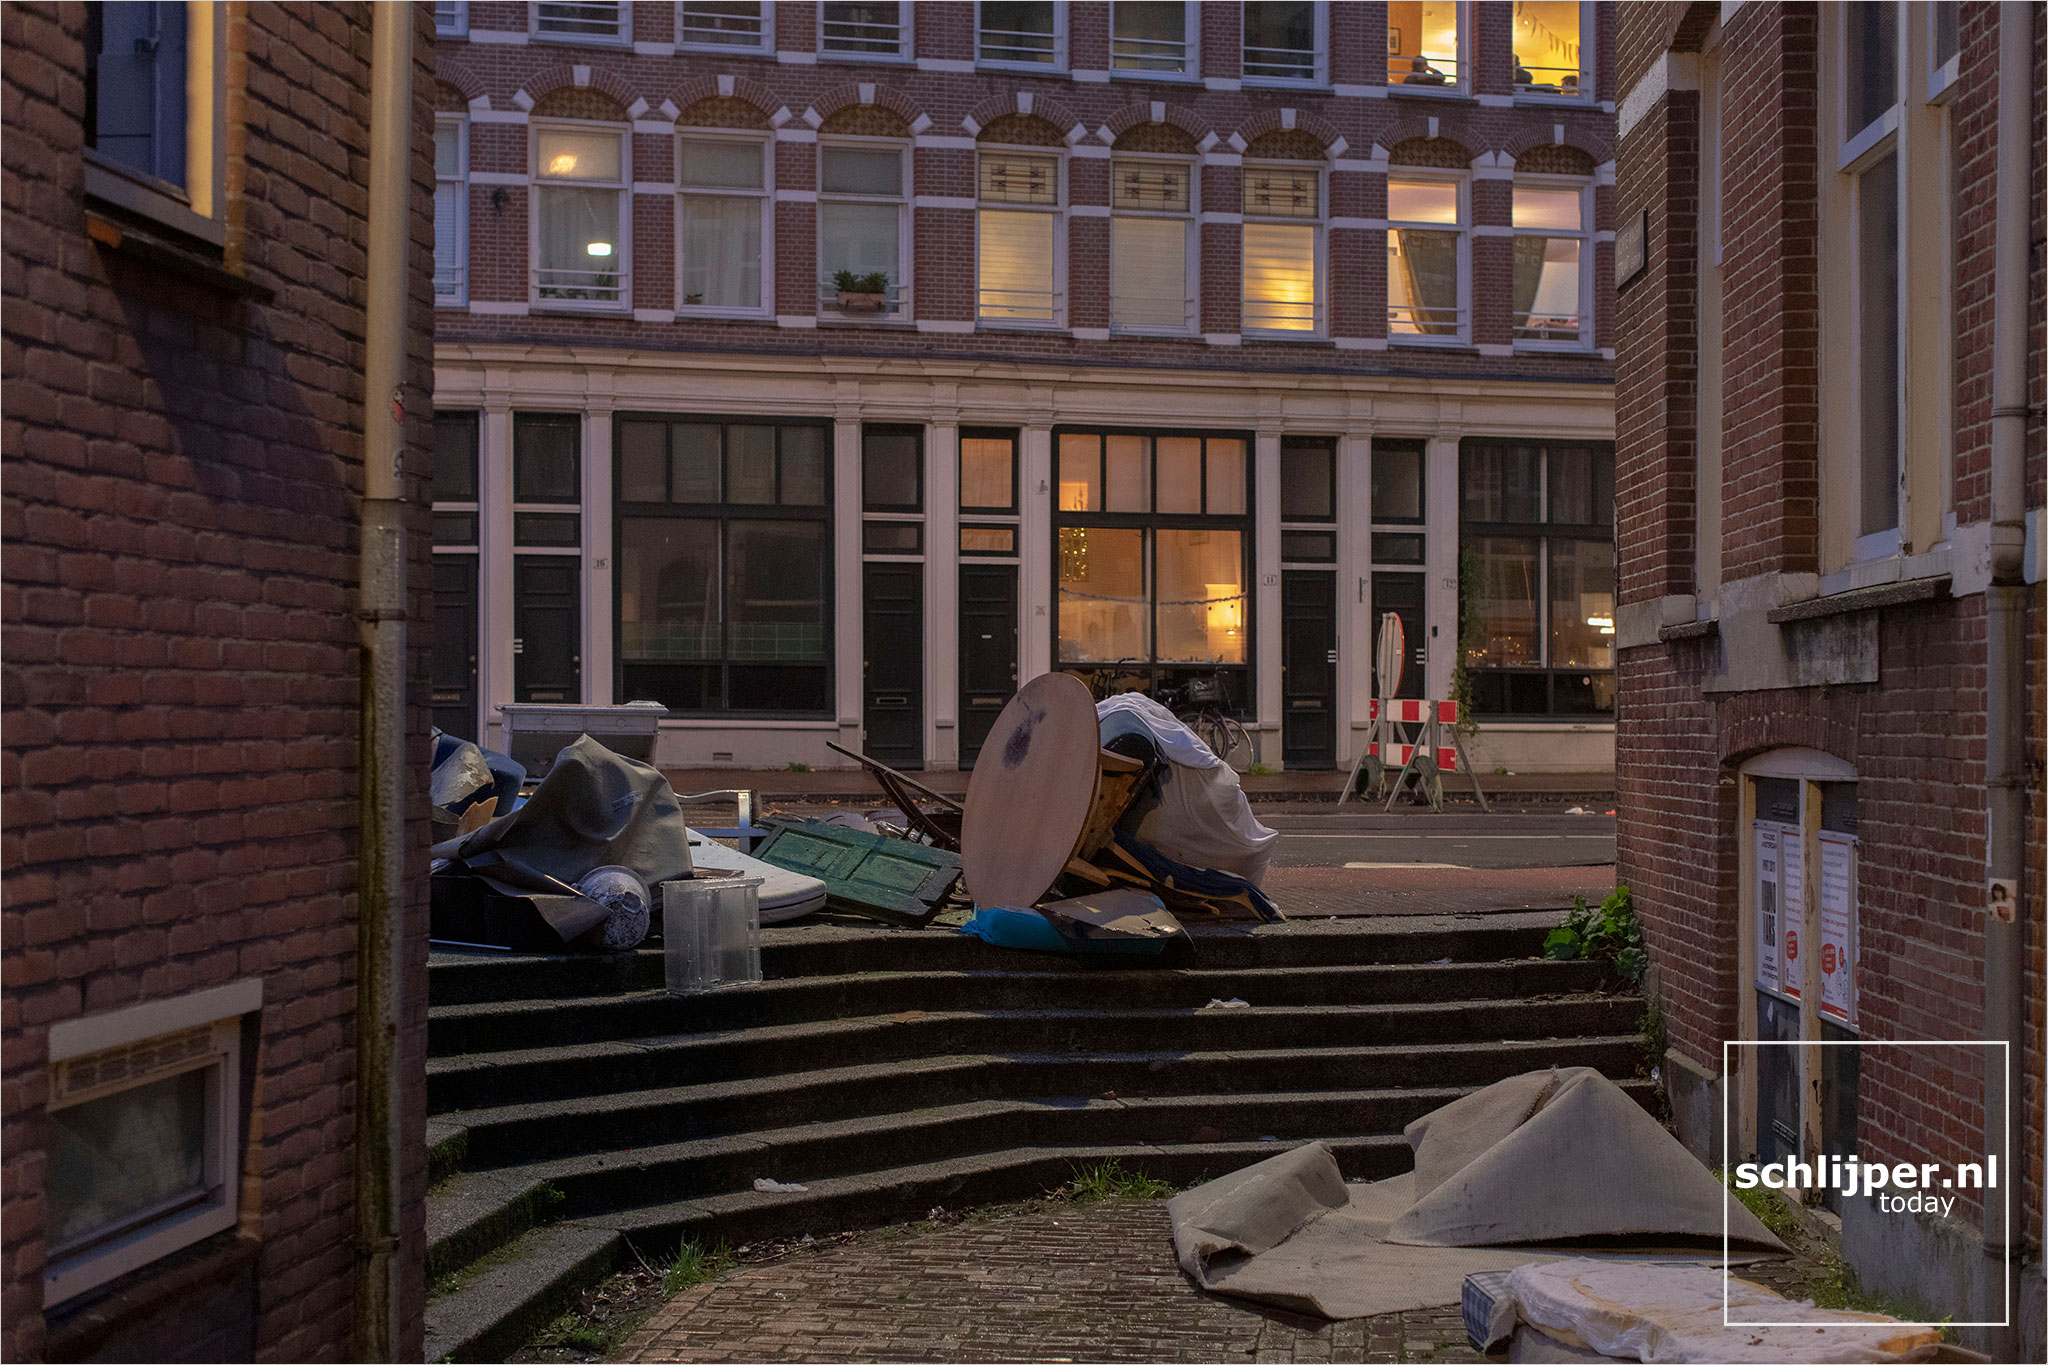 The Netherlands, Amsterdam, 3 december 2020